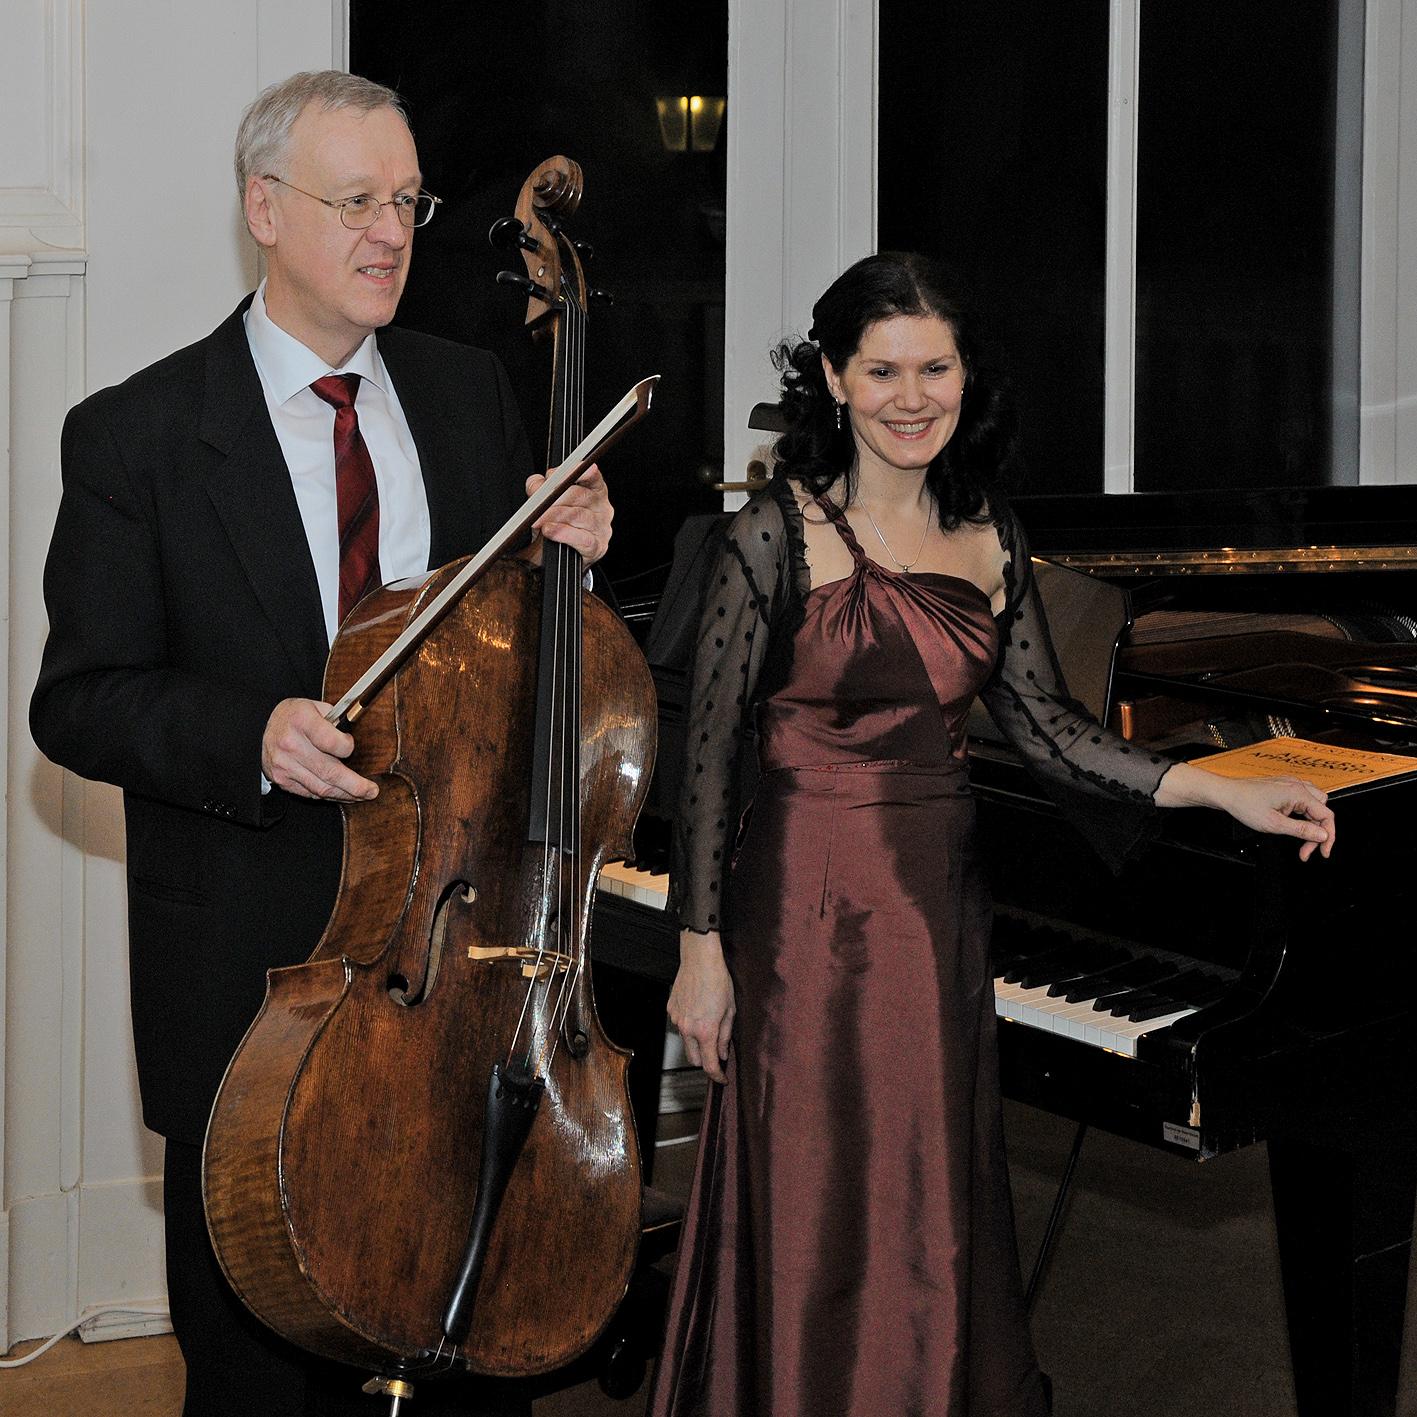 Gabriella_Brezózcki-Wedewardt_&_Johannes_Wohlmacher